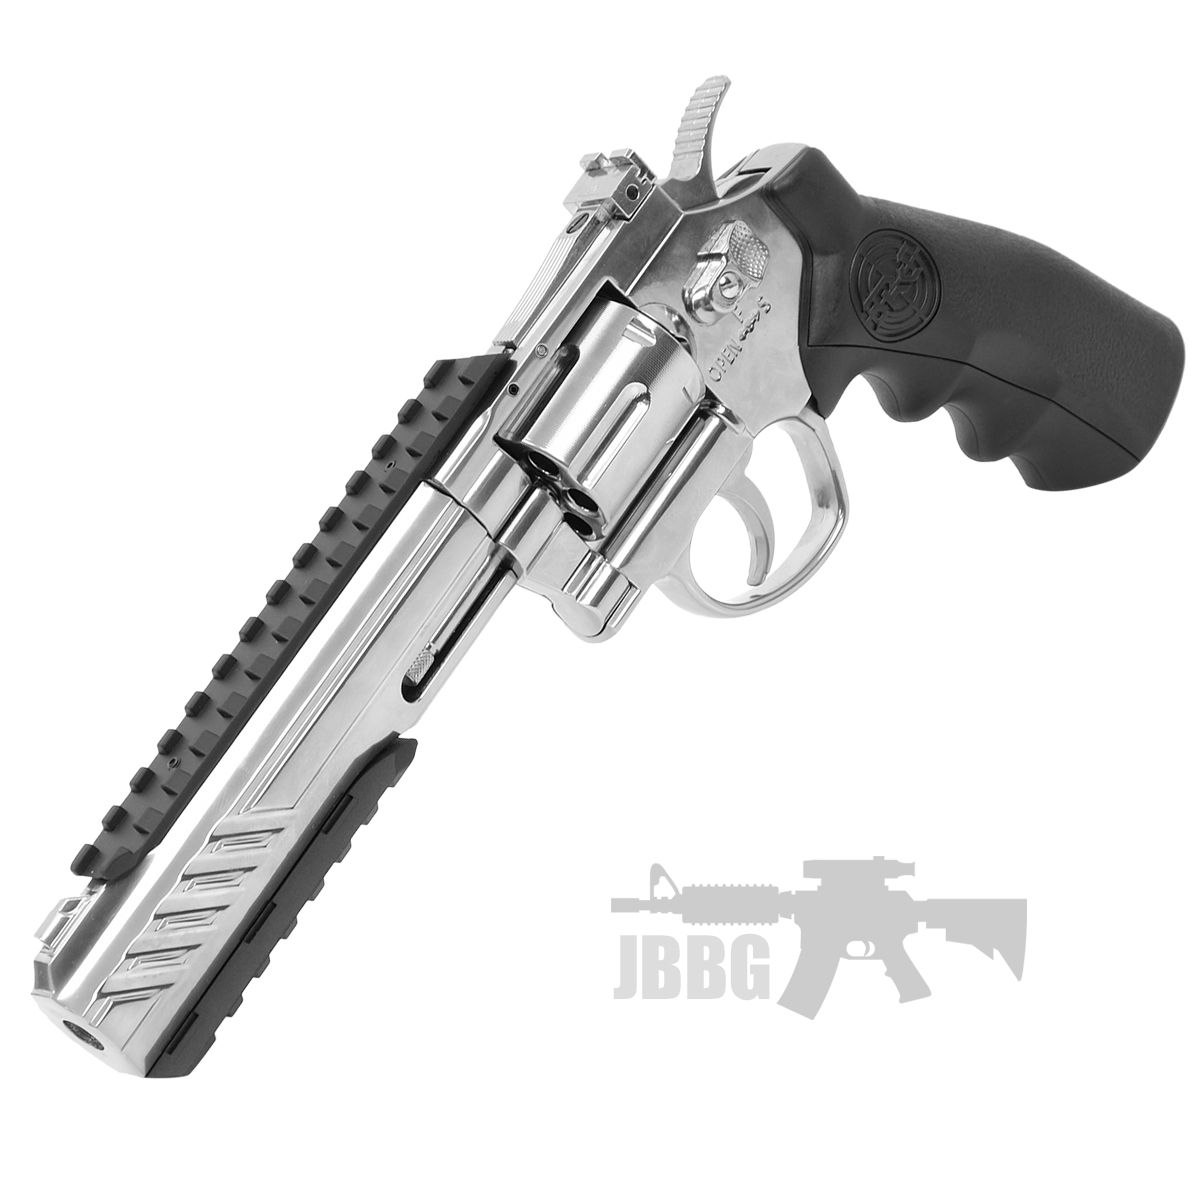 SRC 6 Inch Titan Platinum Ver CO2 Airsoft Revolver 6